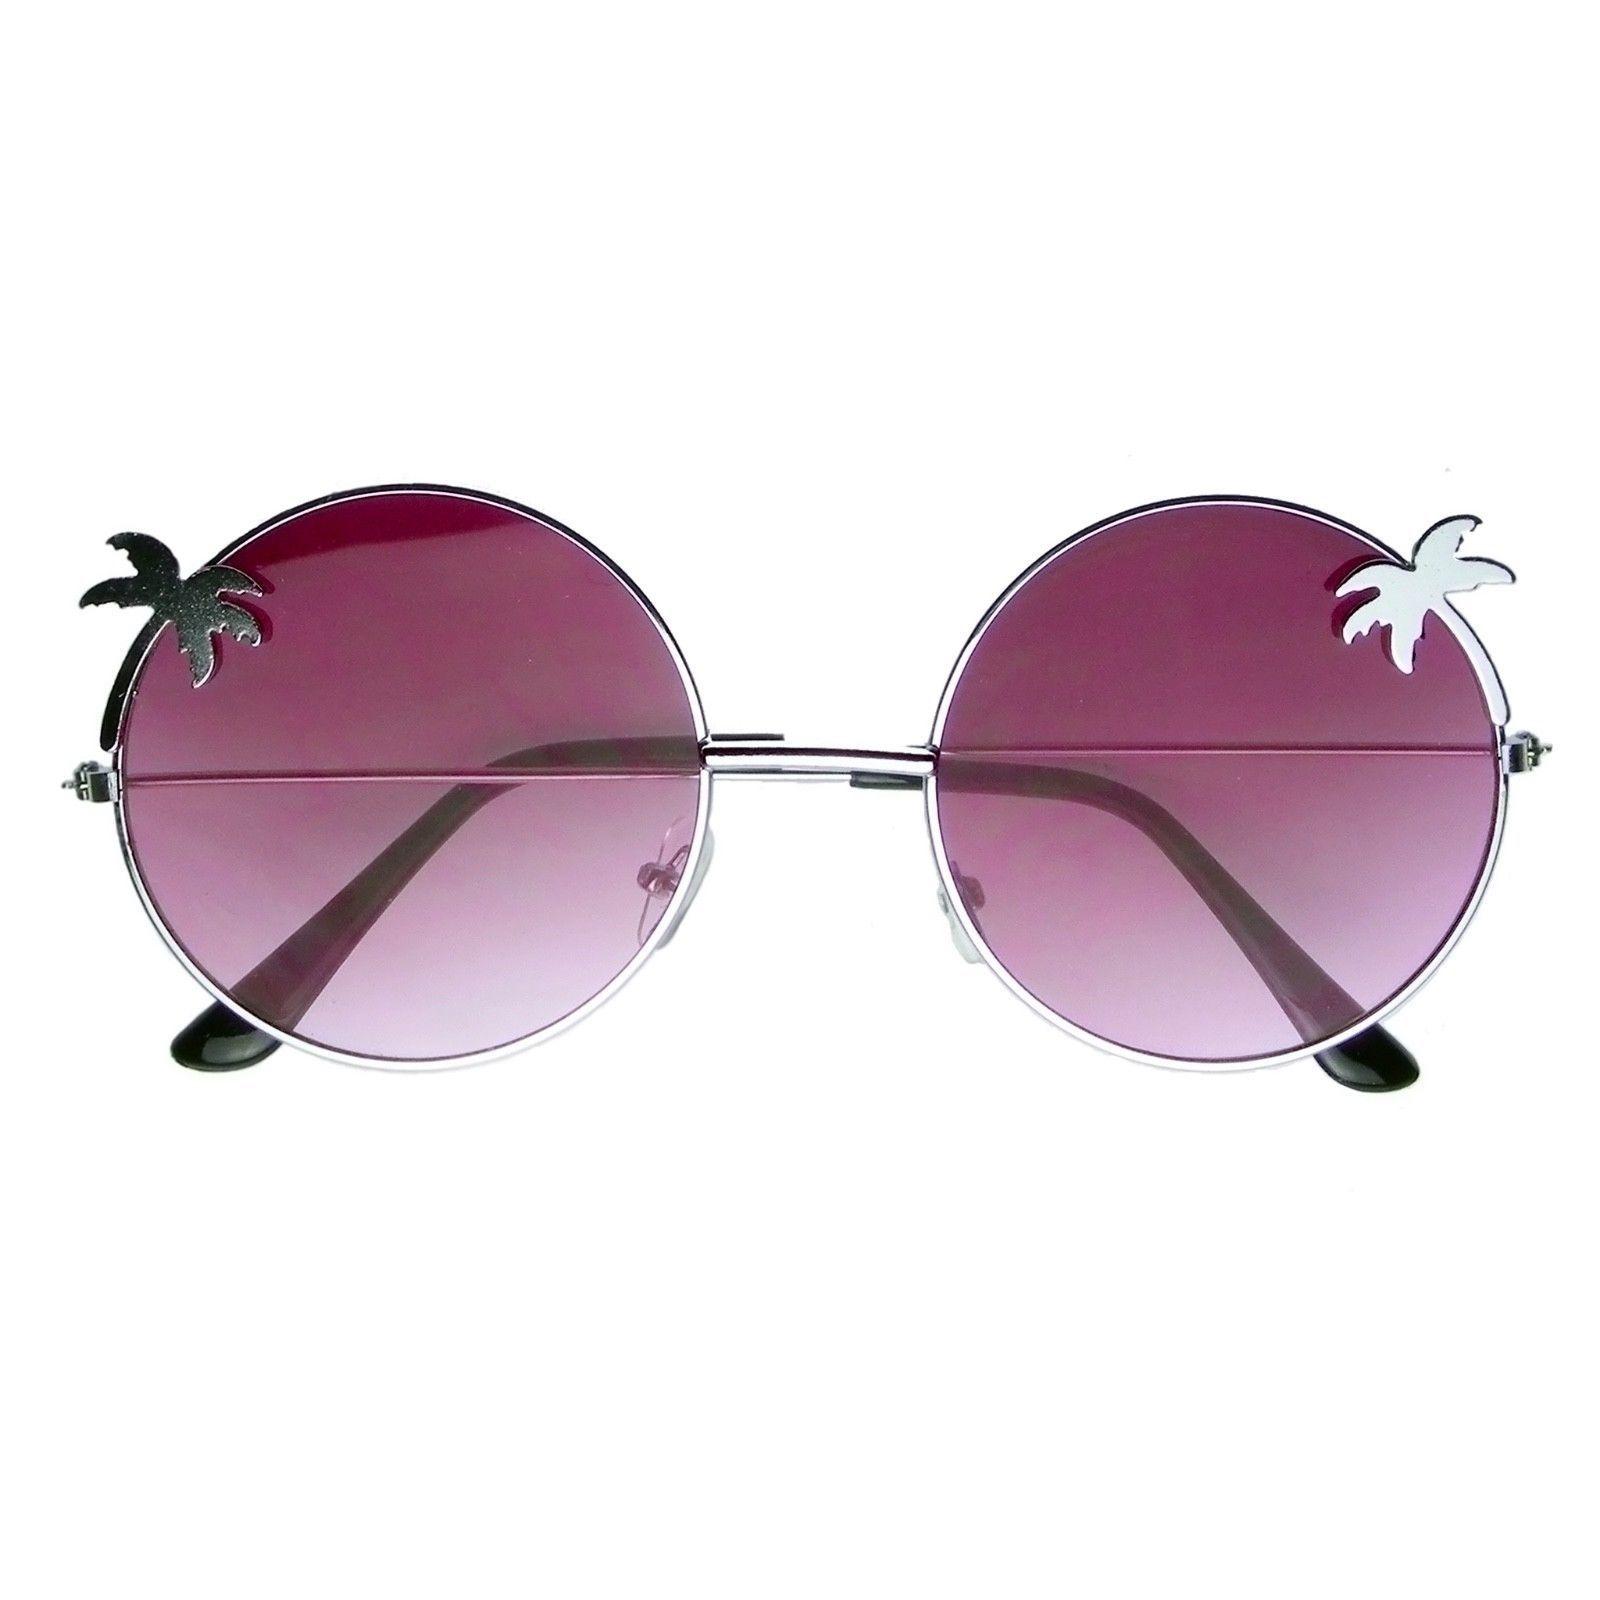 Vintage Retro Round Sun Glasses Hippie Boho Sunglasses image 5